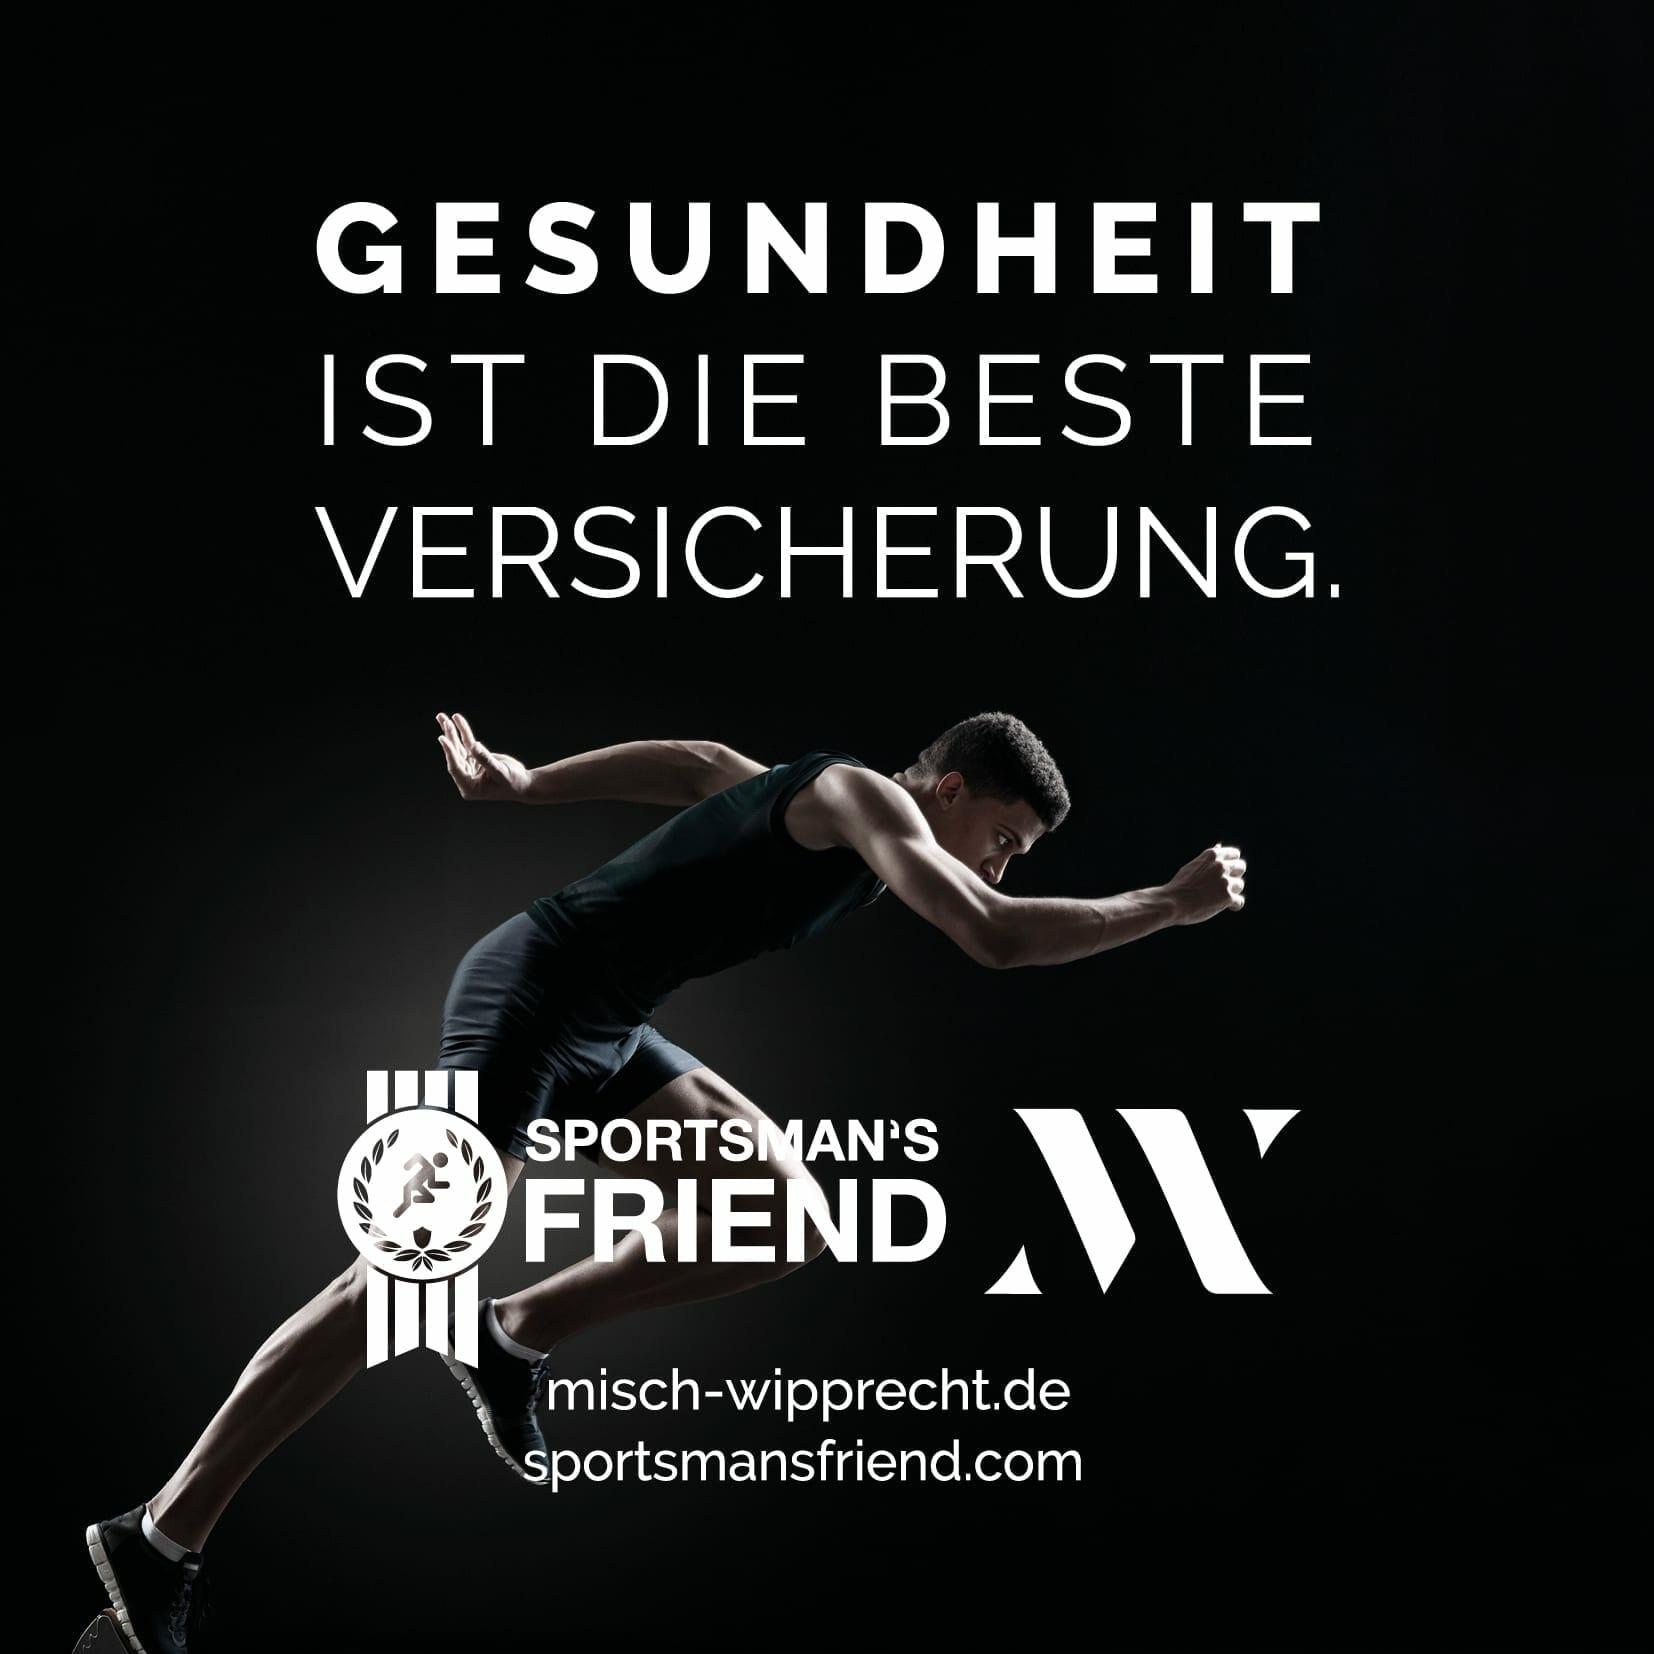 Sportsmansfriend